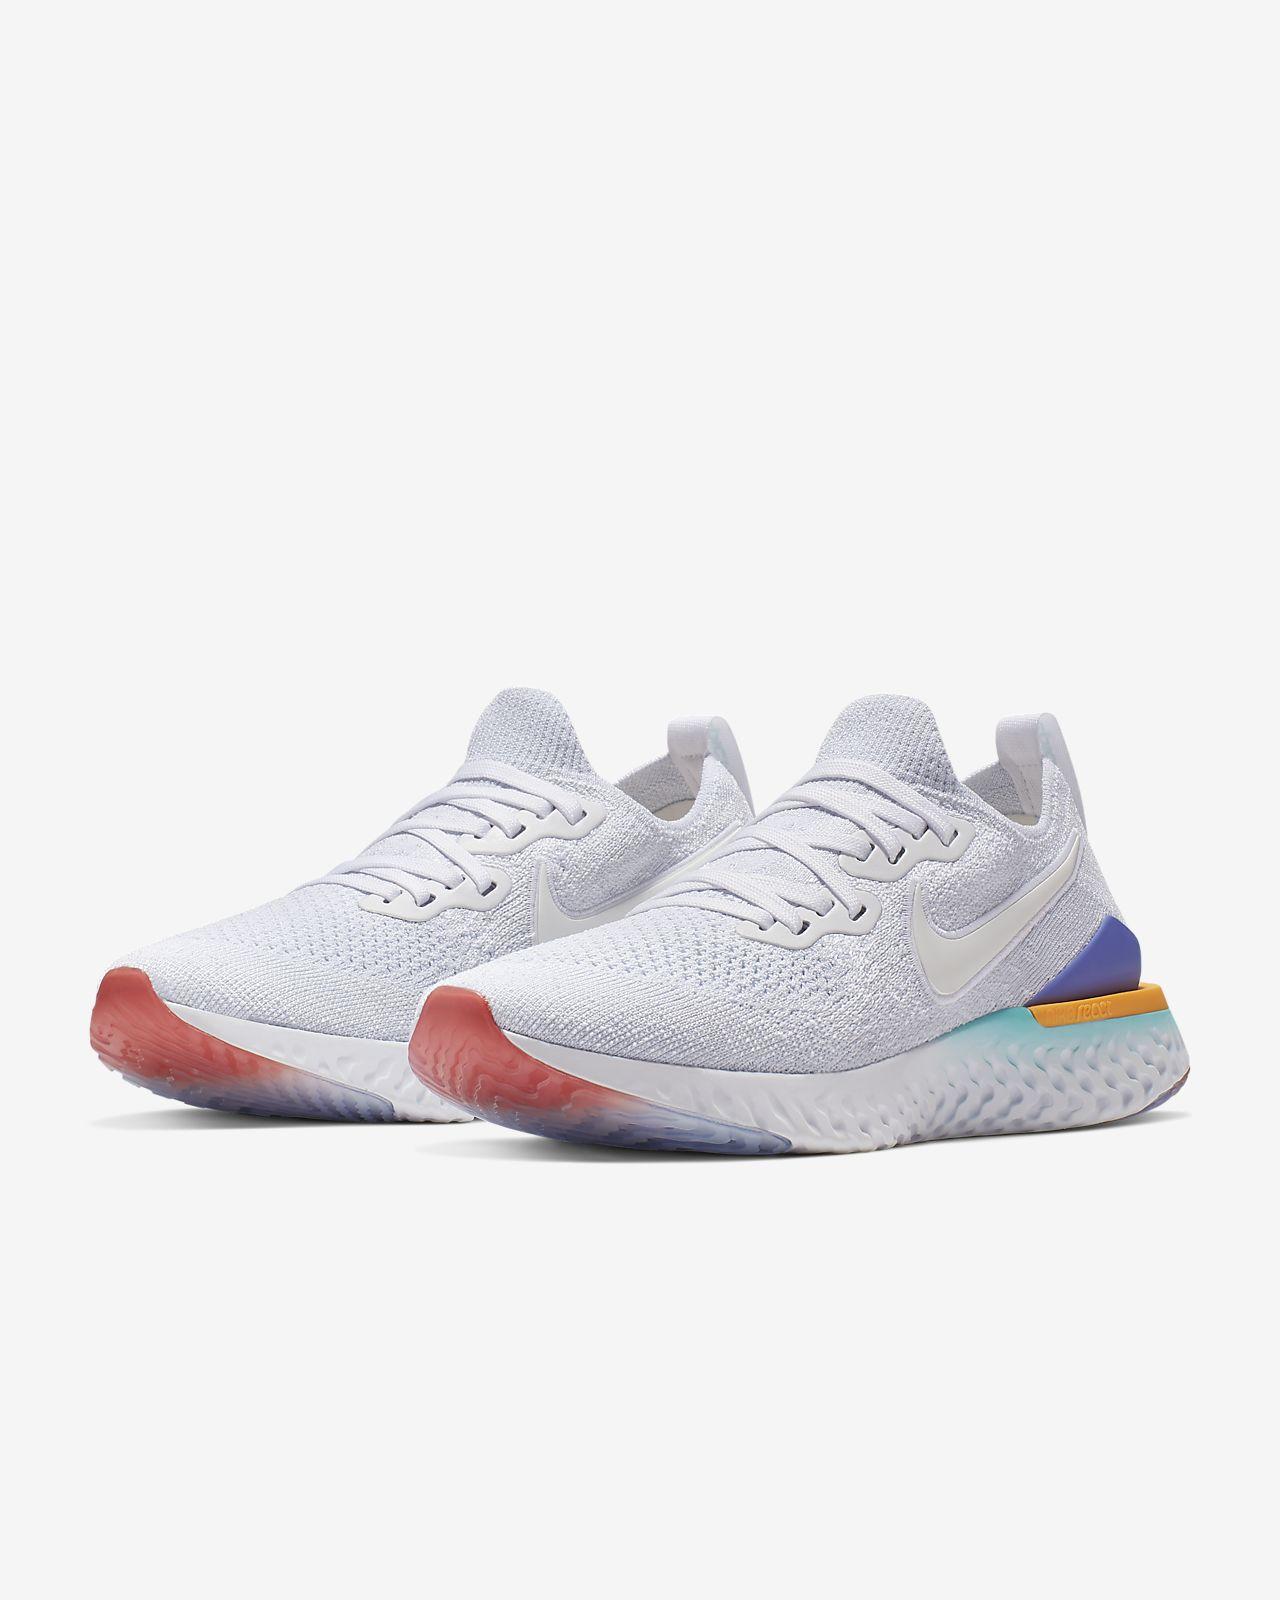 brand new 3021d 61bee Nike Epic React Flyknit 2 Women's Running Shoe. Nike.com